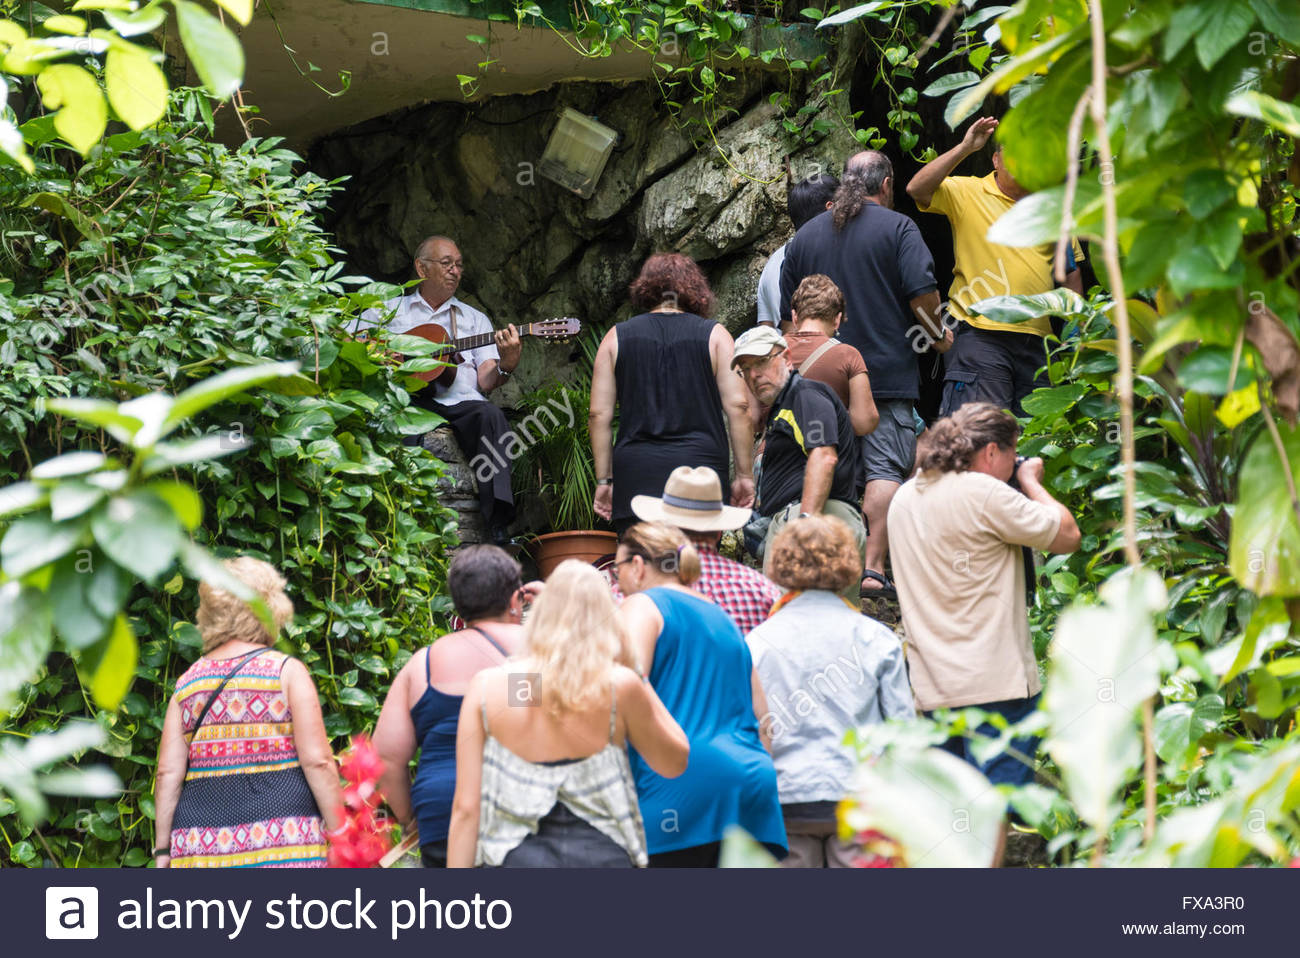 Vinales Caves Stockfotos & Vinales Caves Bilder - Alamy